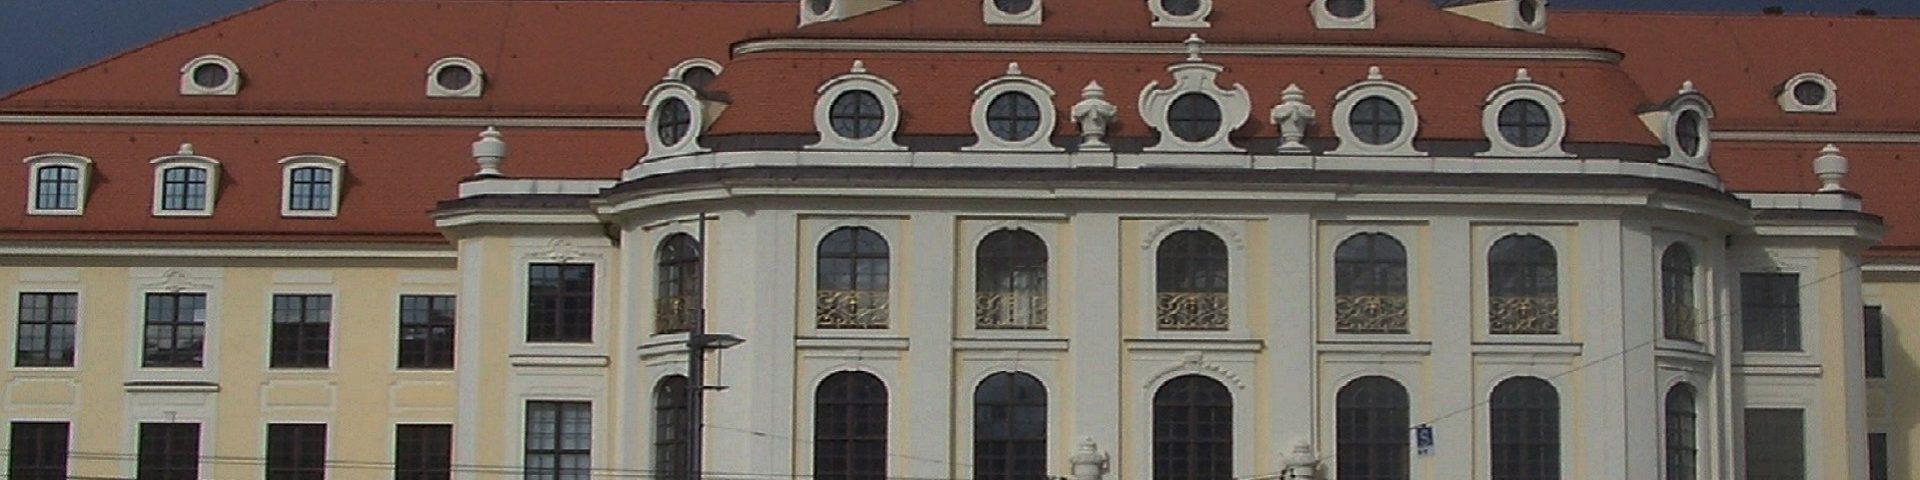 125 Jahre Stadtmuseum Dresden